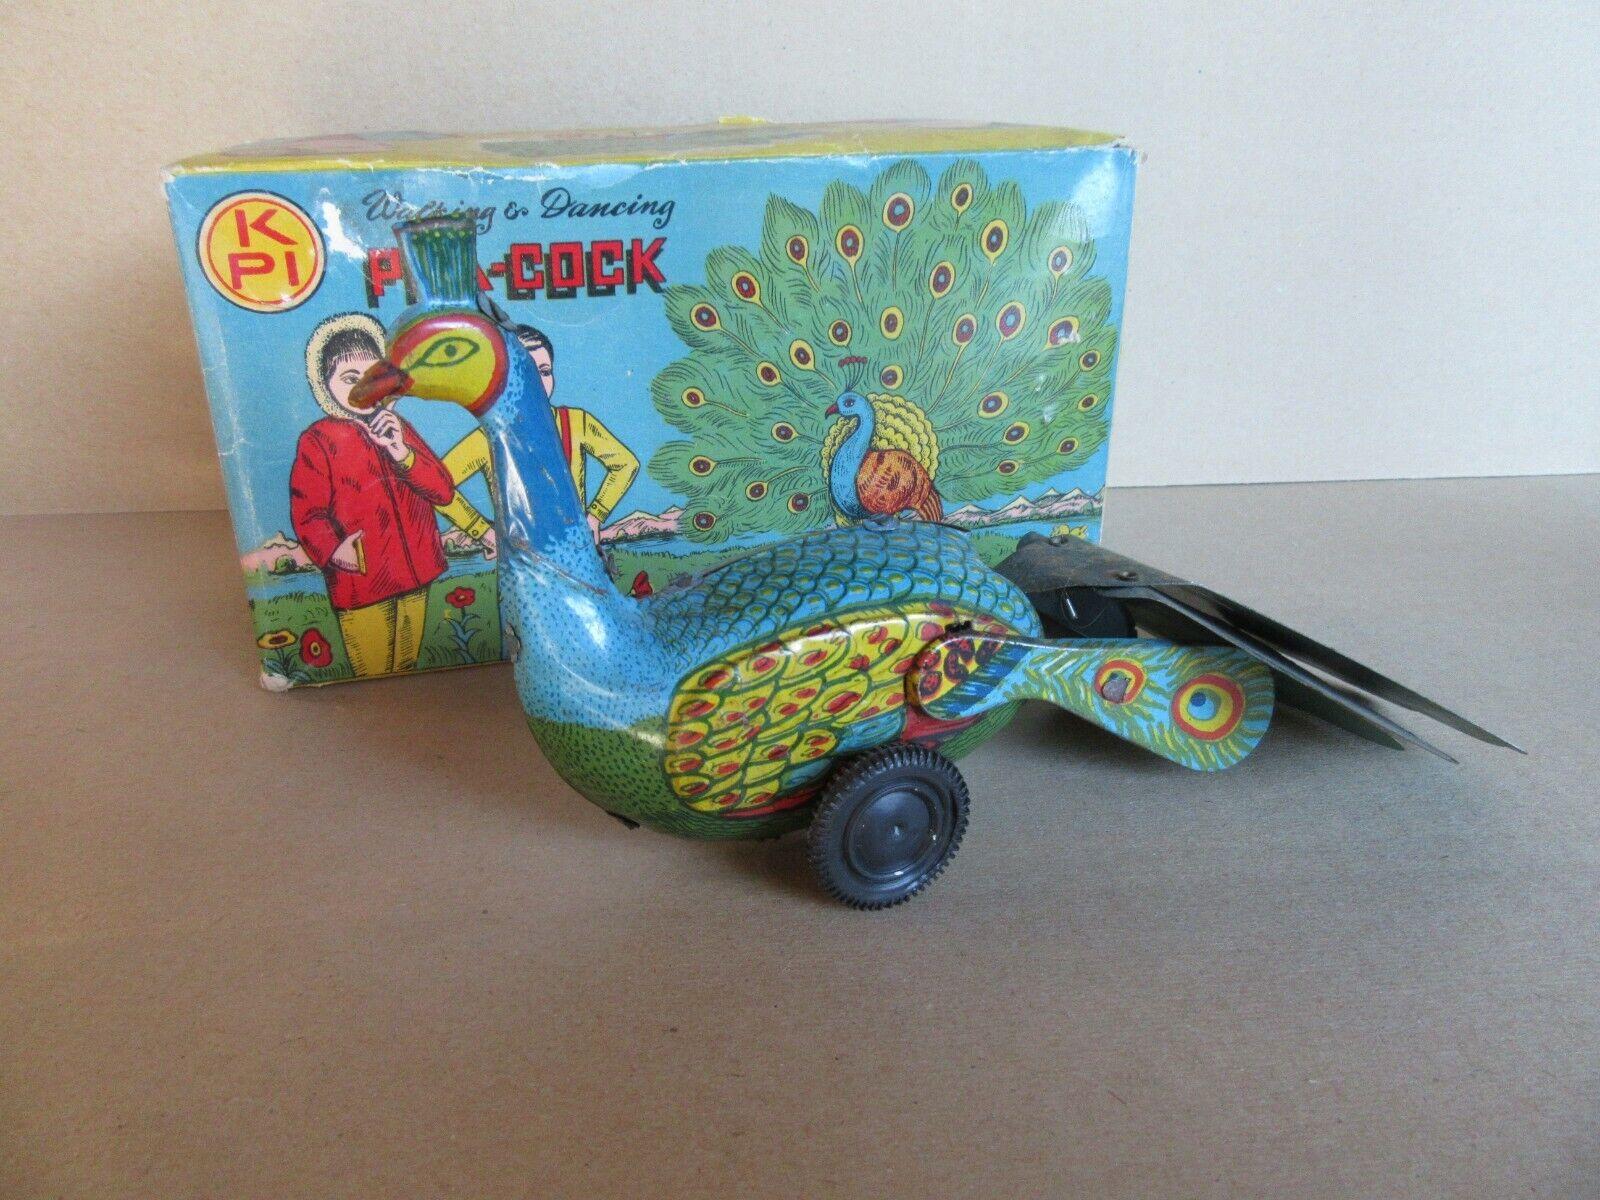 791K Zeldzame Toy Old Mechanical in Sheet Metal Kpi Pea-Cock